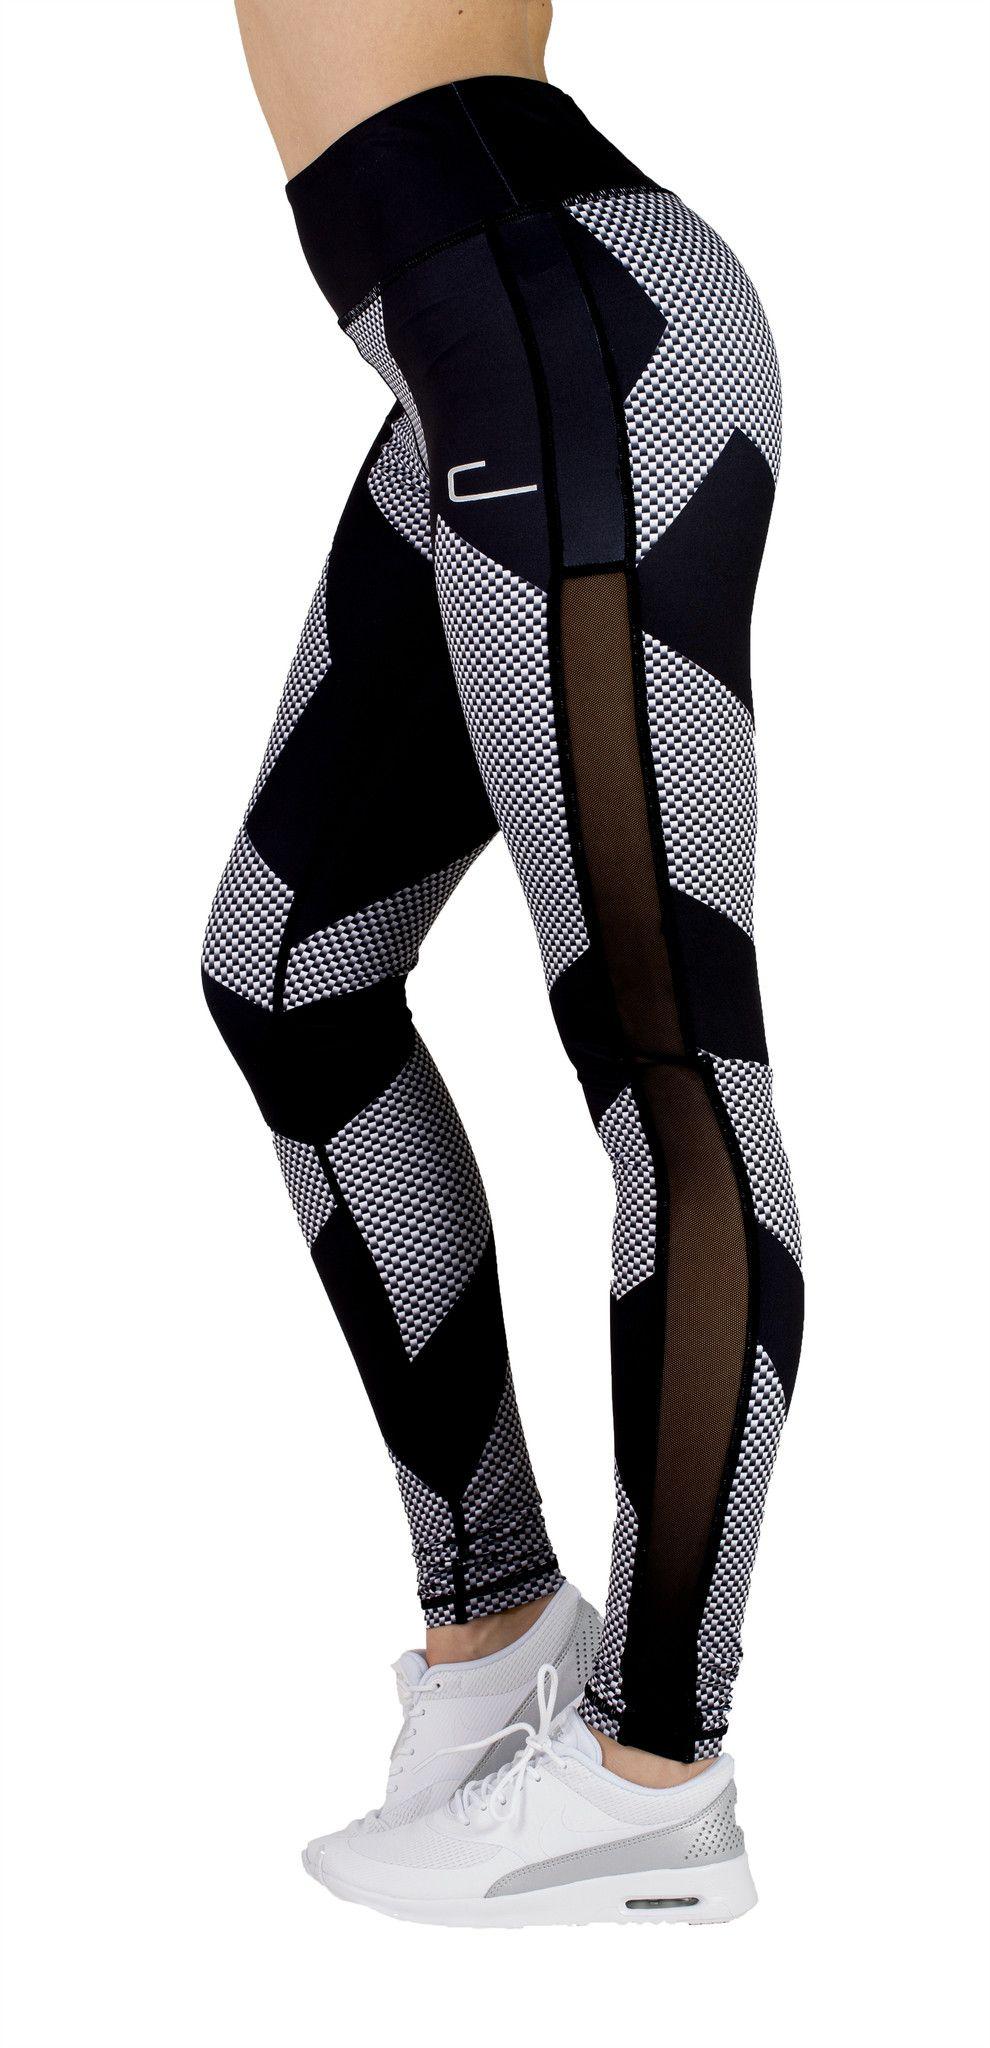 Carbon Design Leggings - Black | Exercise clothing ...